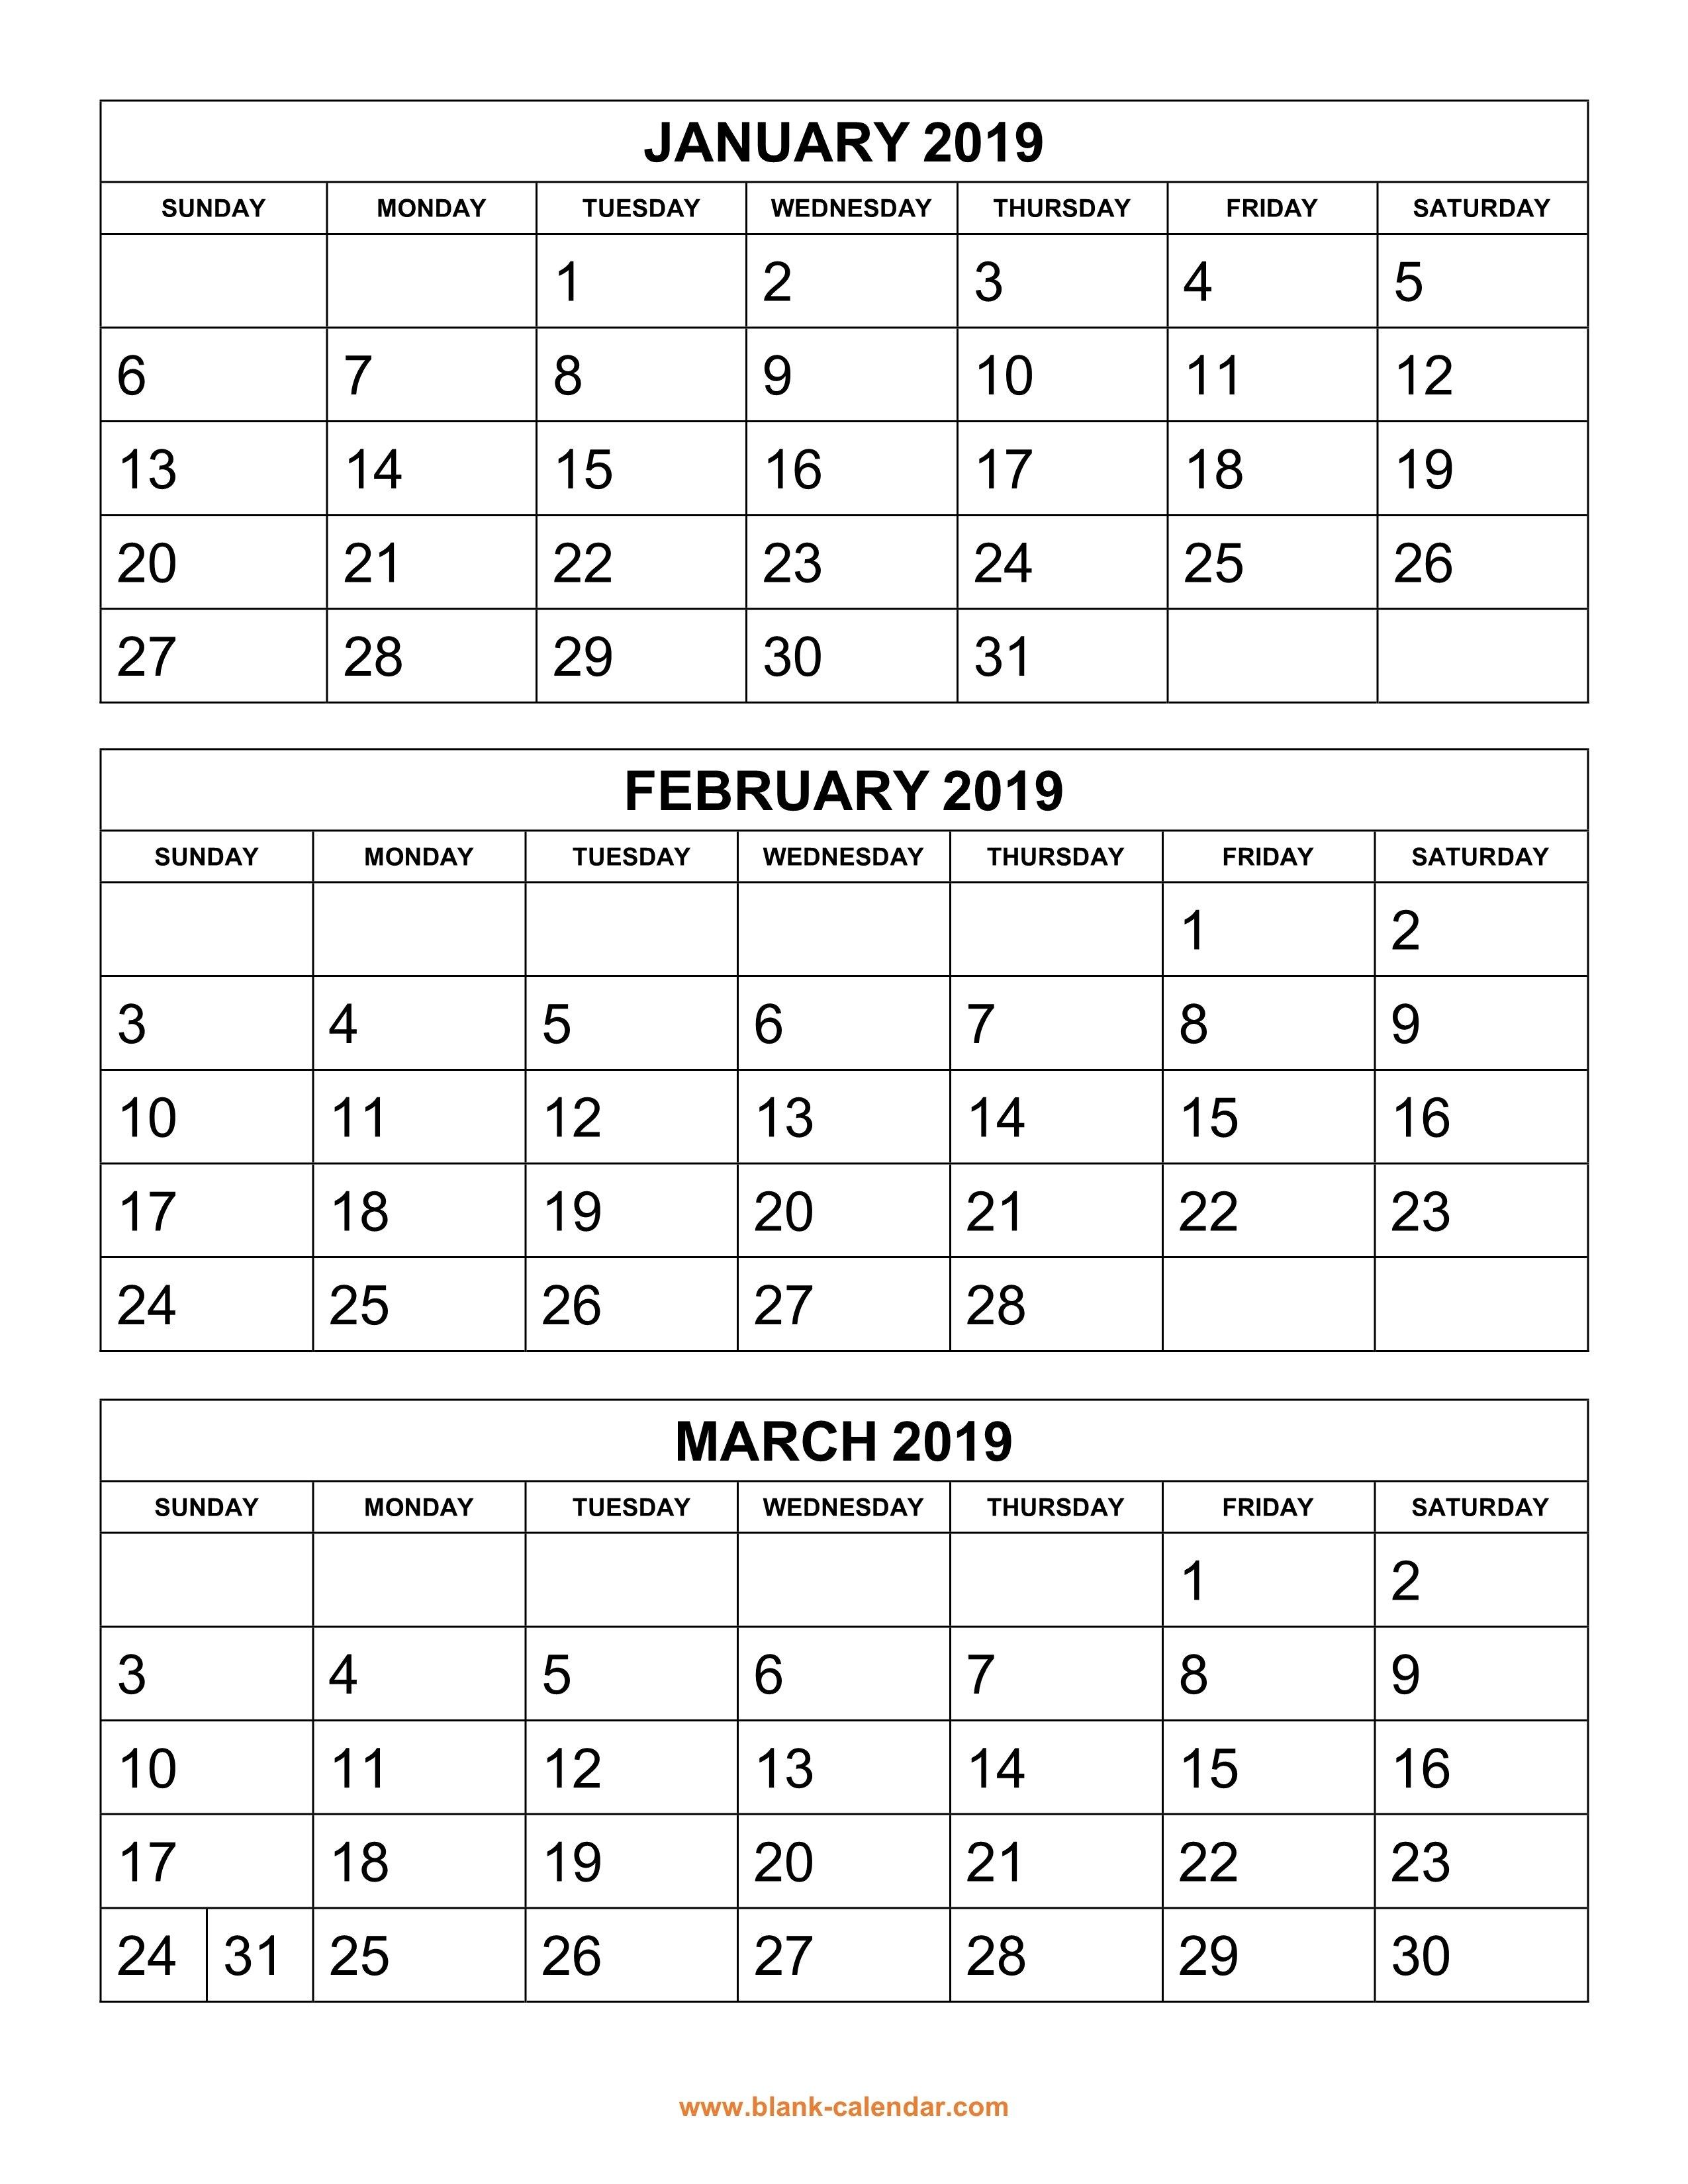 Free Download Printable Calendar 2019, 3 Months Per Page, 4 Pages Calendar 2019 Printable Monthly